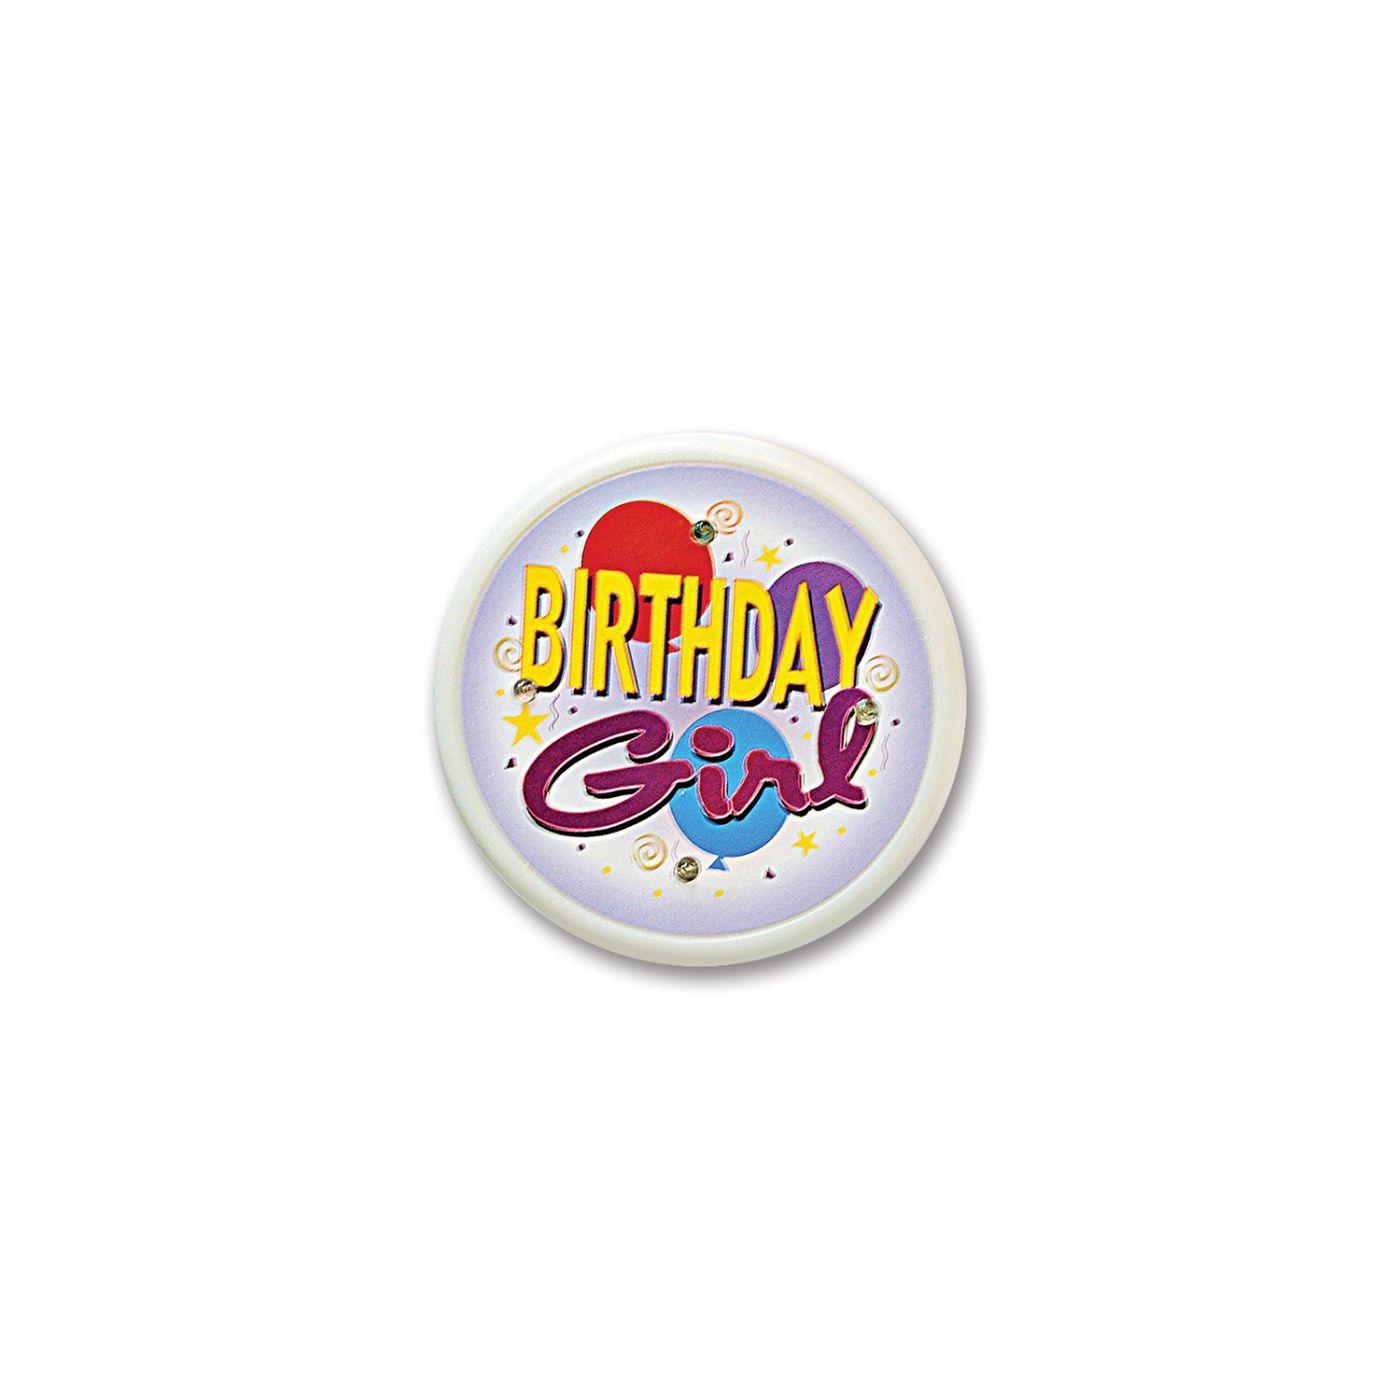 Birthday Girl Flashing Button (6) image